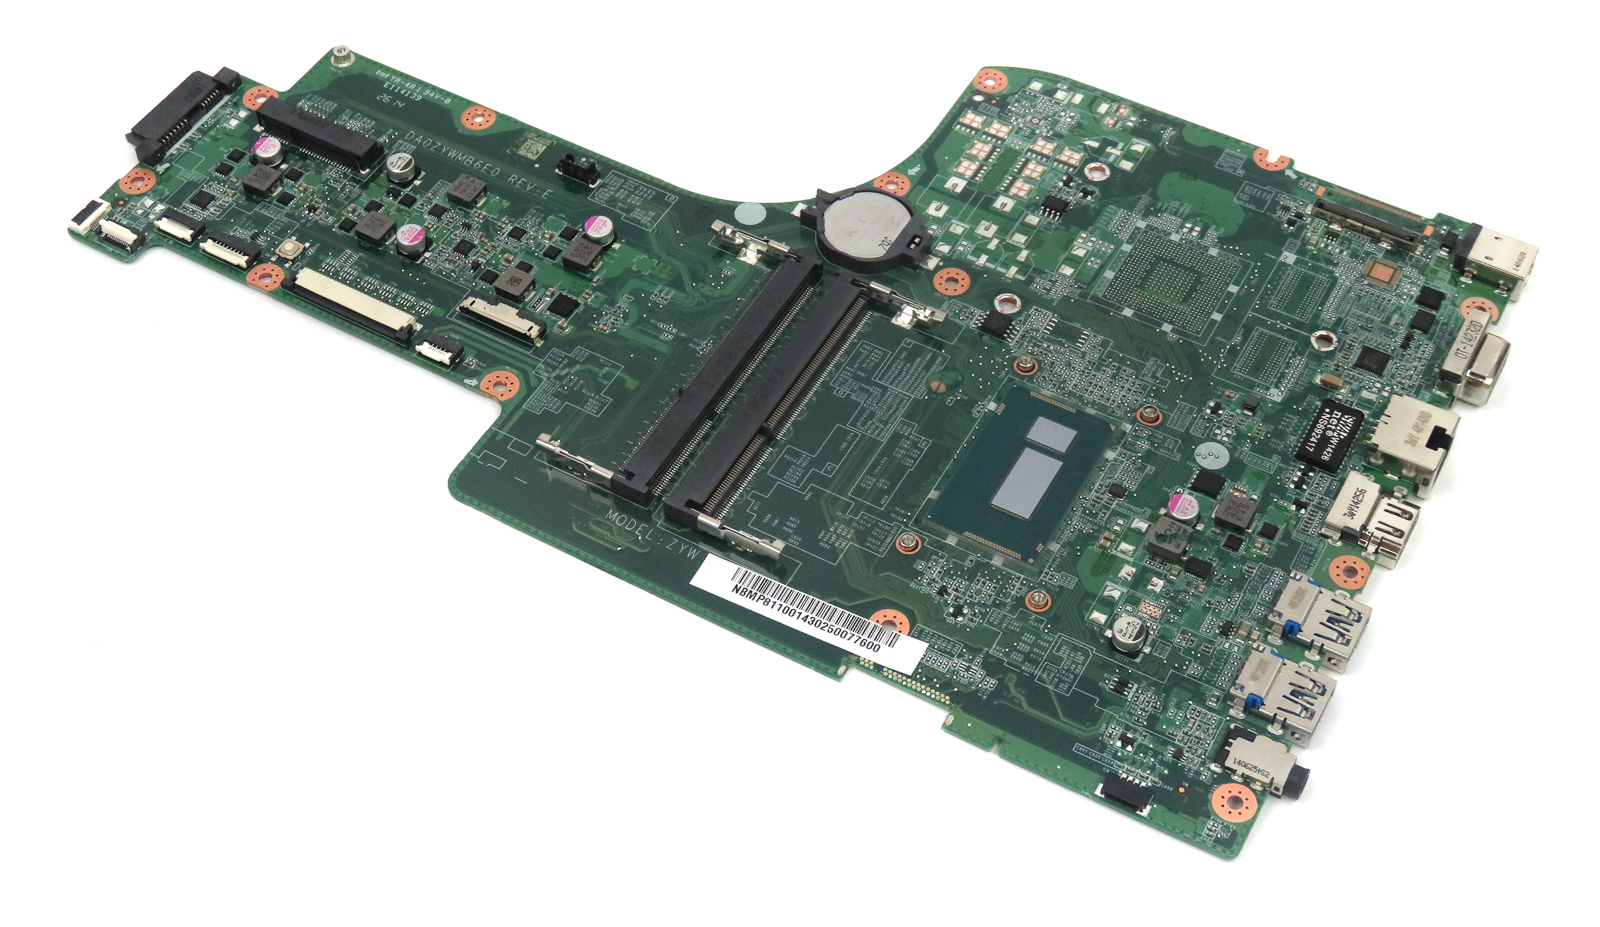 Acer Aspire E5-771 NB.MP811.001 Laptop Motherboard  w/ Pentium 3556U